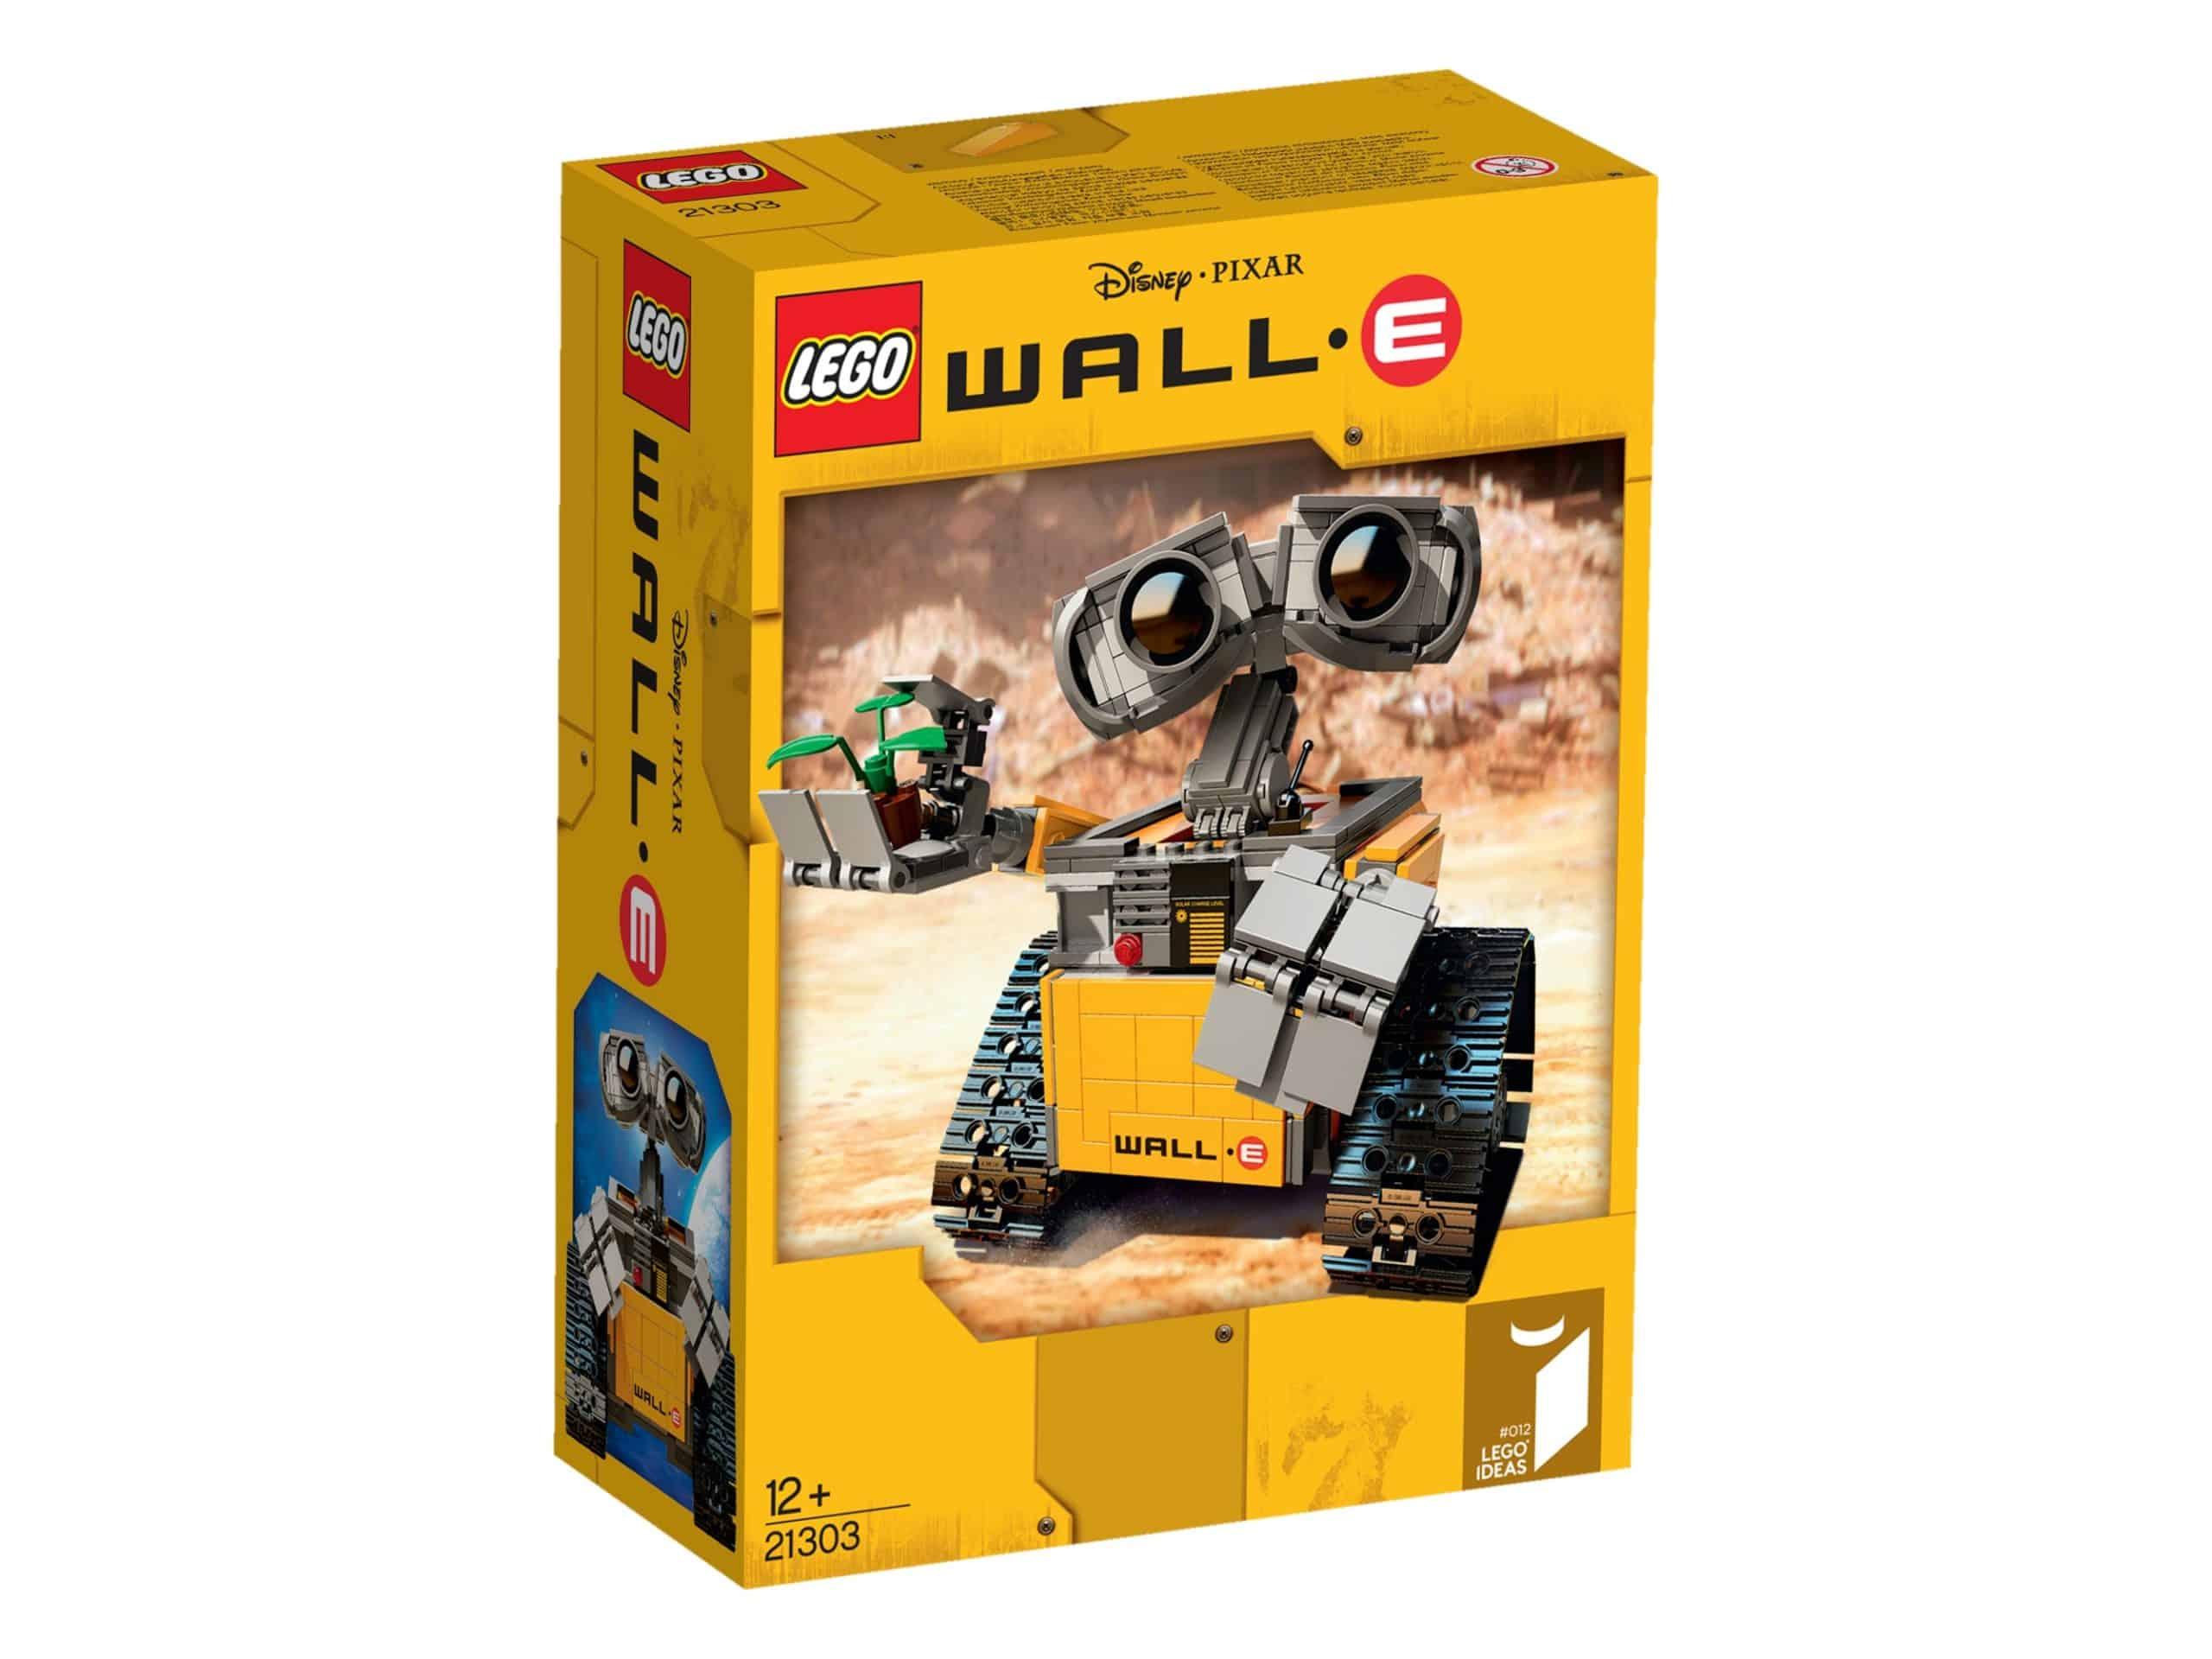 LEGO 21303 WALL-E